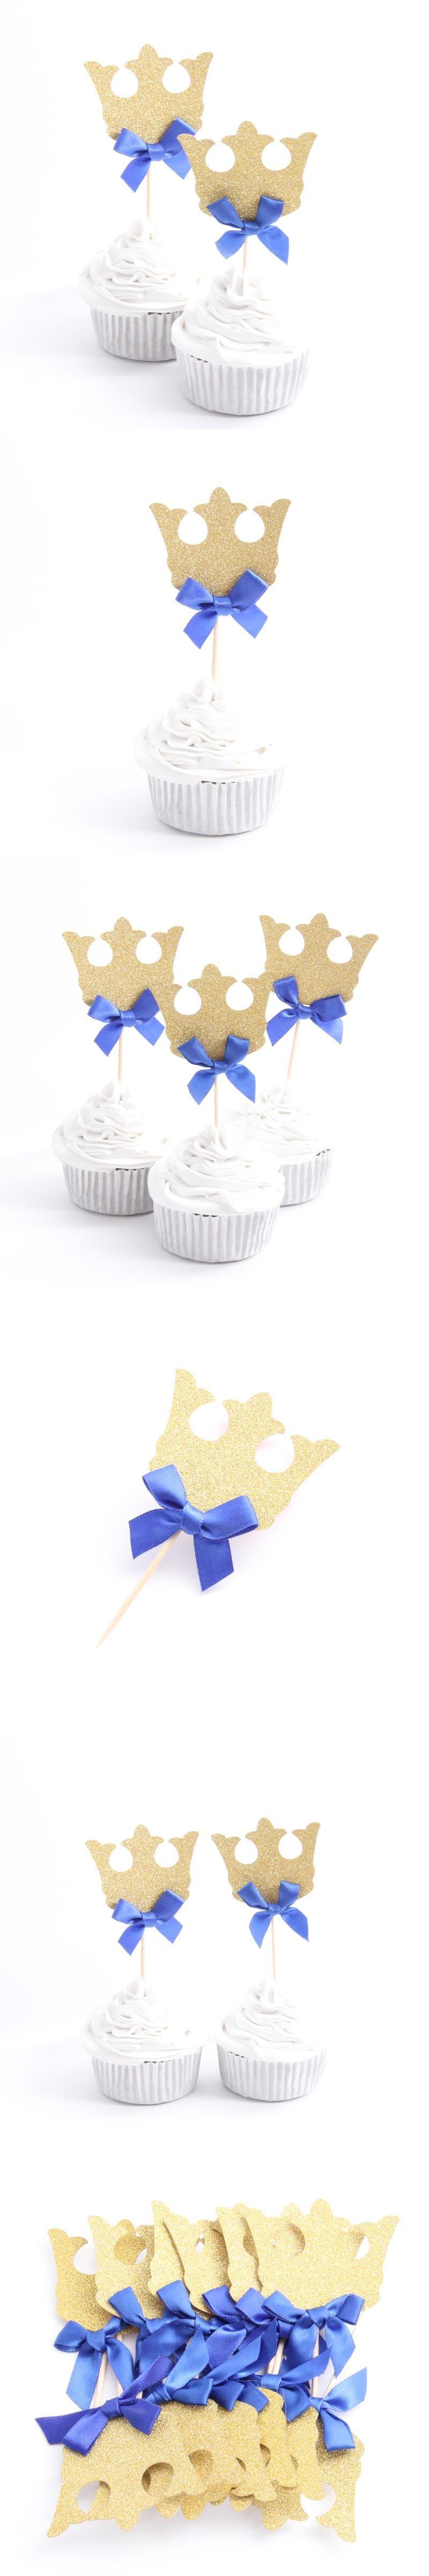 12pcs/lot Prince Crown Cupcake Topper Theme Cartoon Party Supplies ...